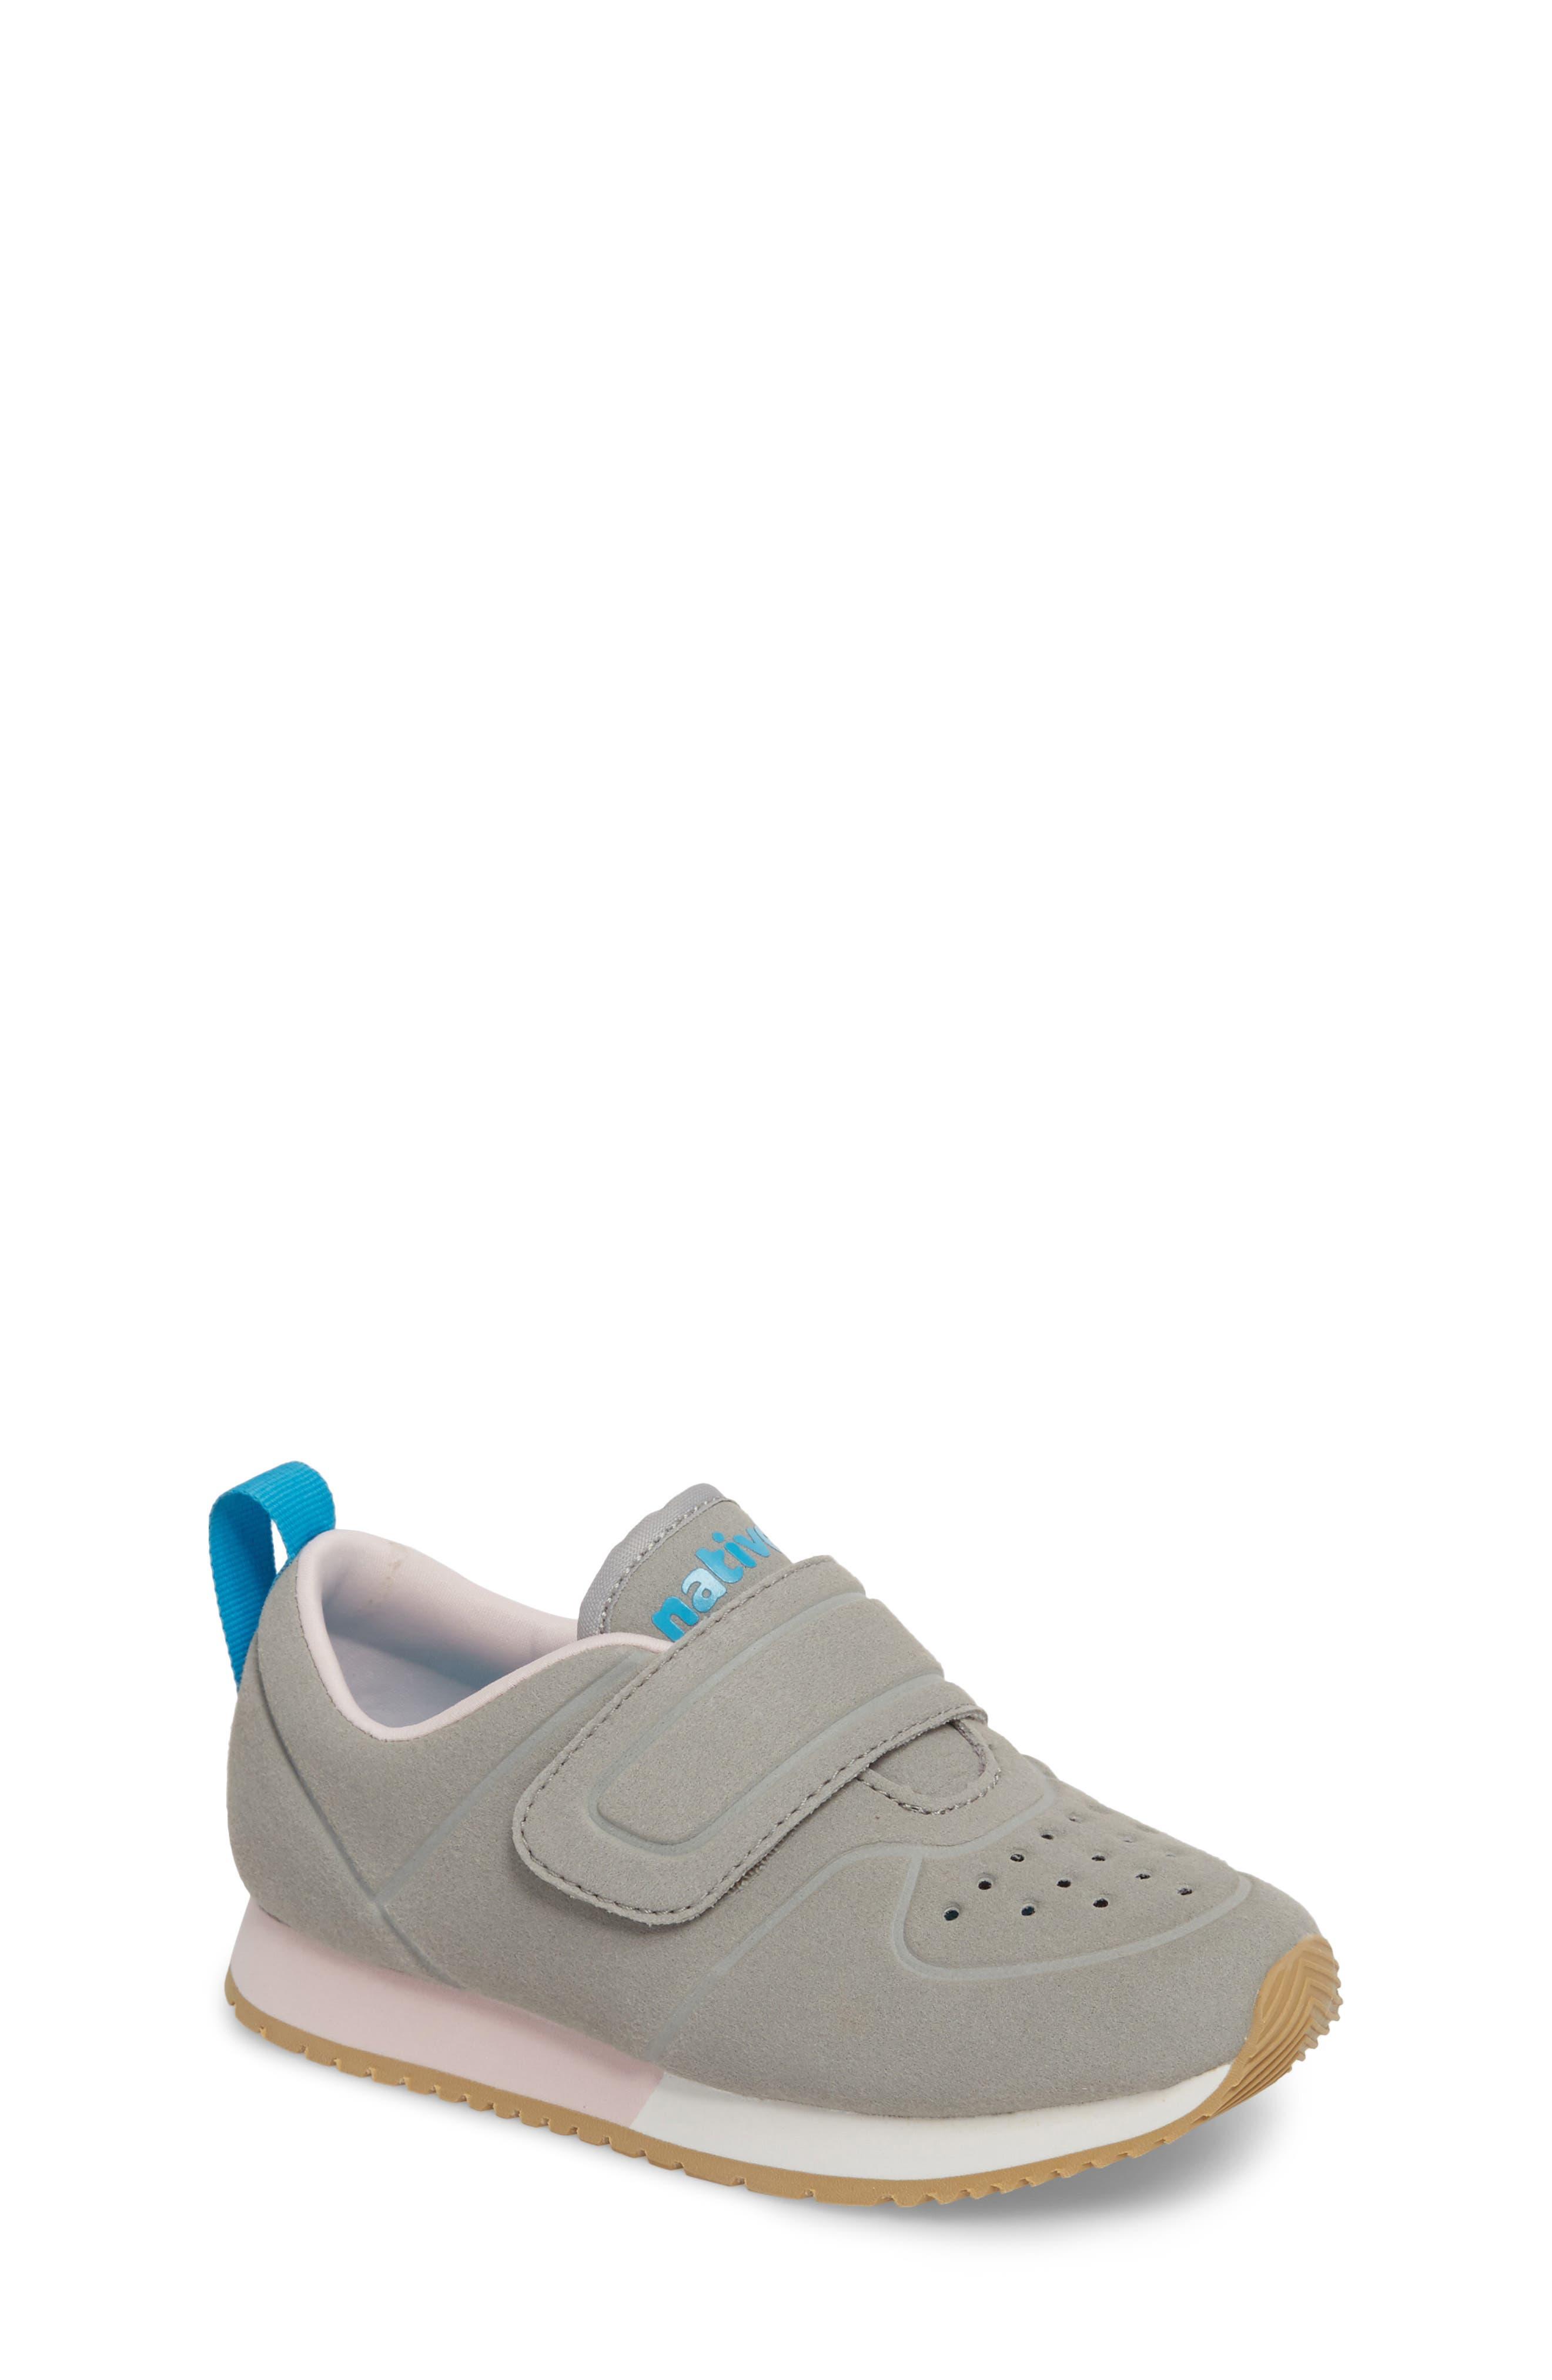 Native Cornell Perforated Sneaker (Walker, Toddler & Little Kid)